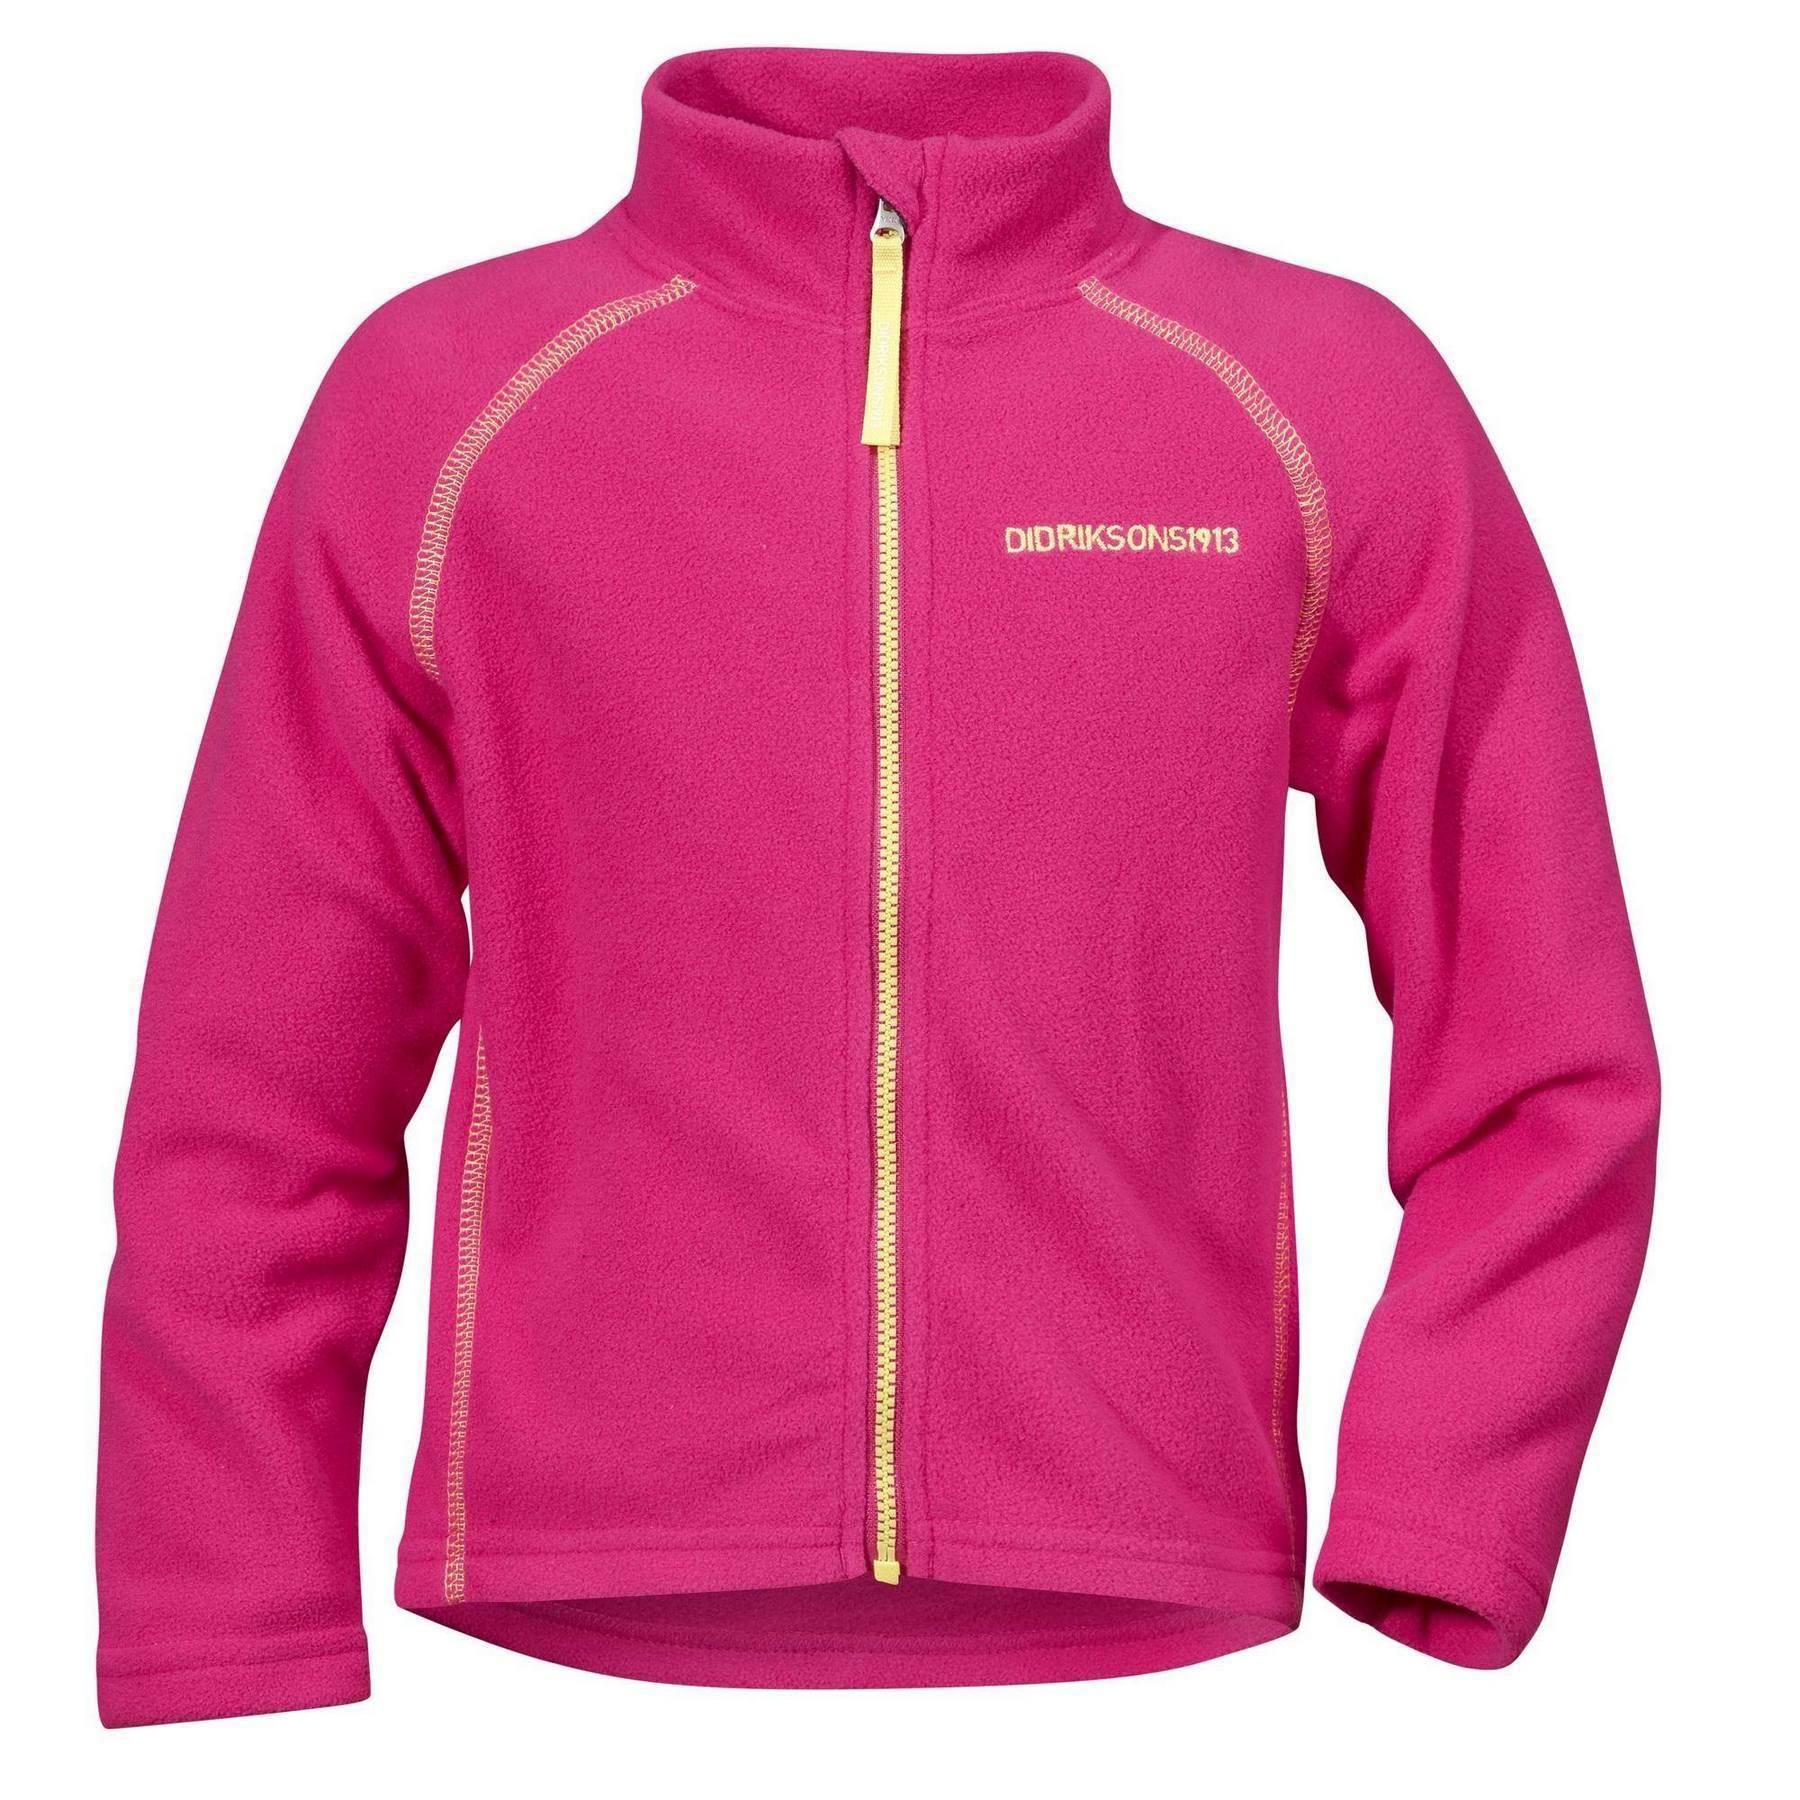 Куртка для детей Didriksons Monte kids - Fuchsia (розовый)